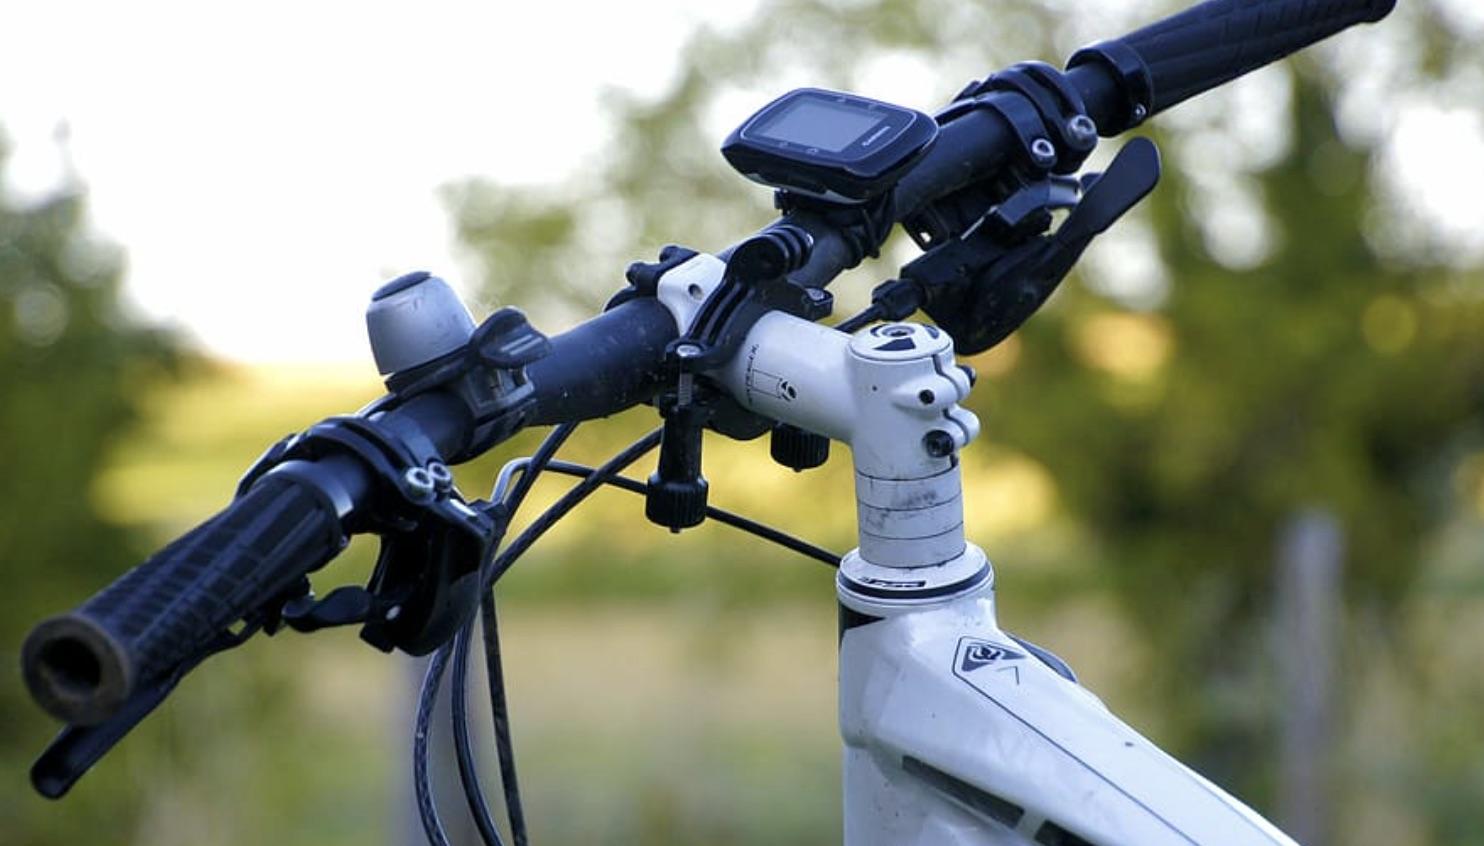 The Best GPS for Mountain Biking